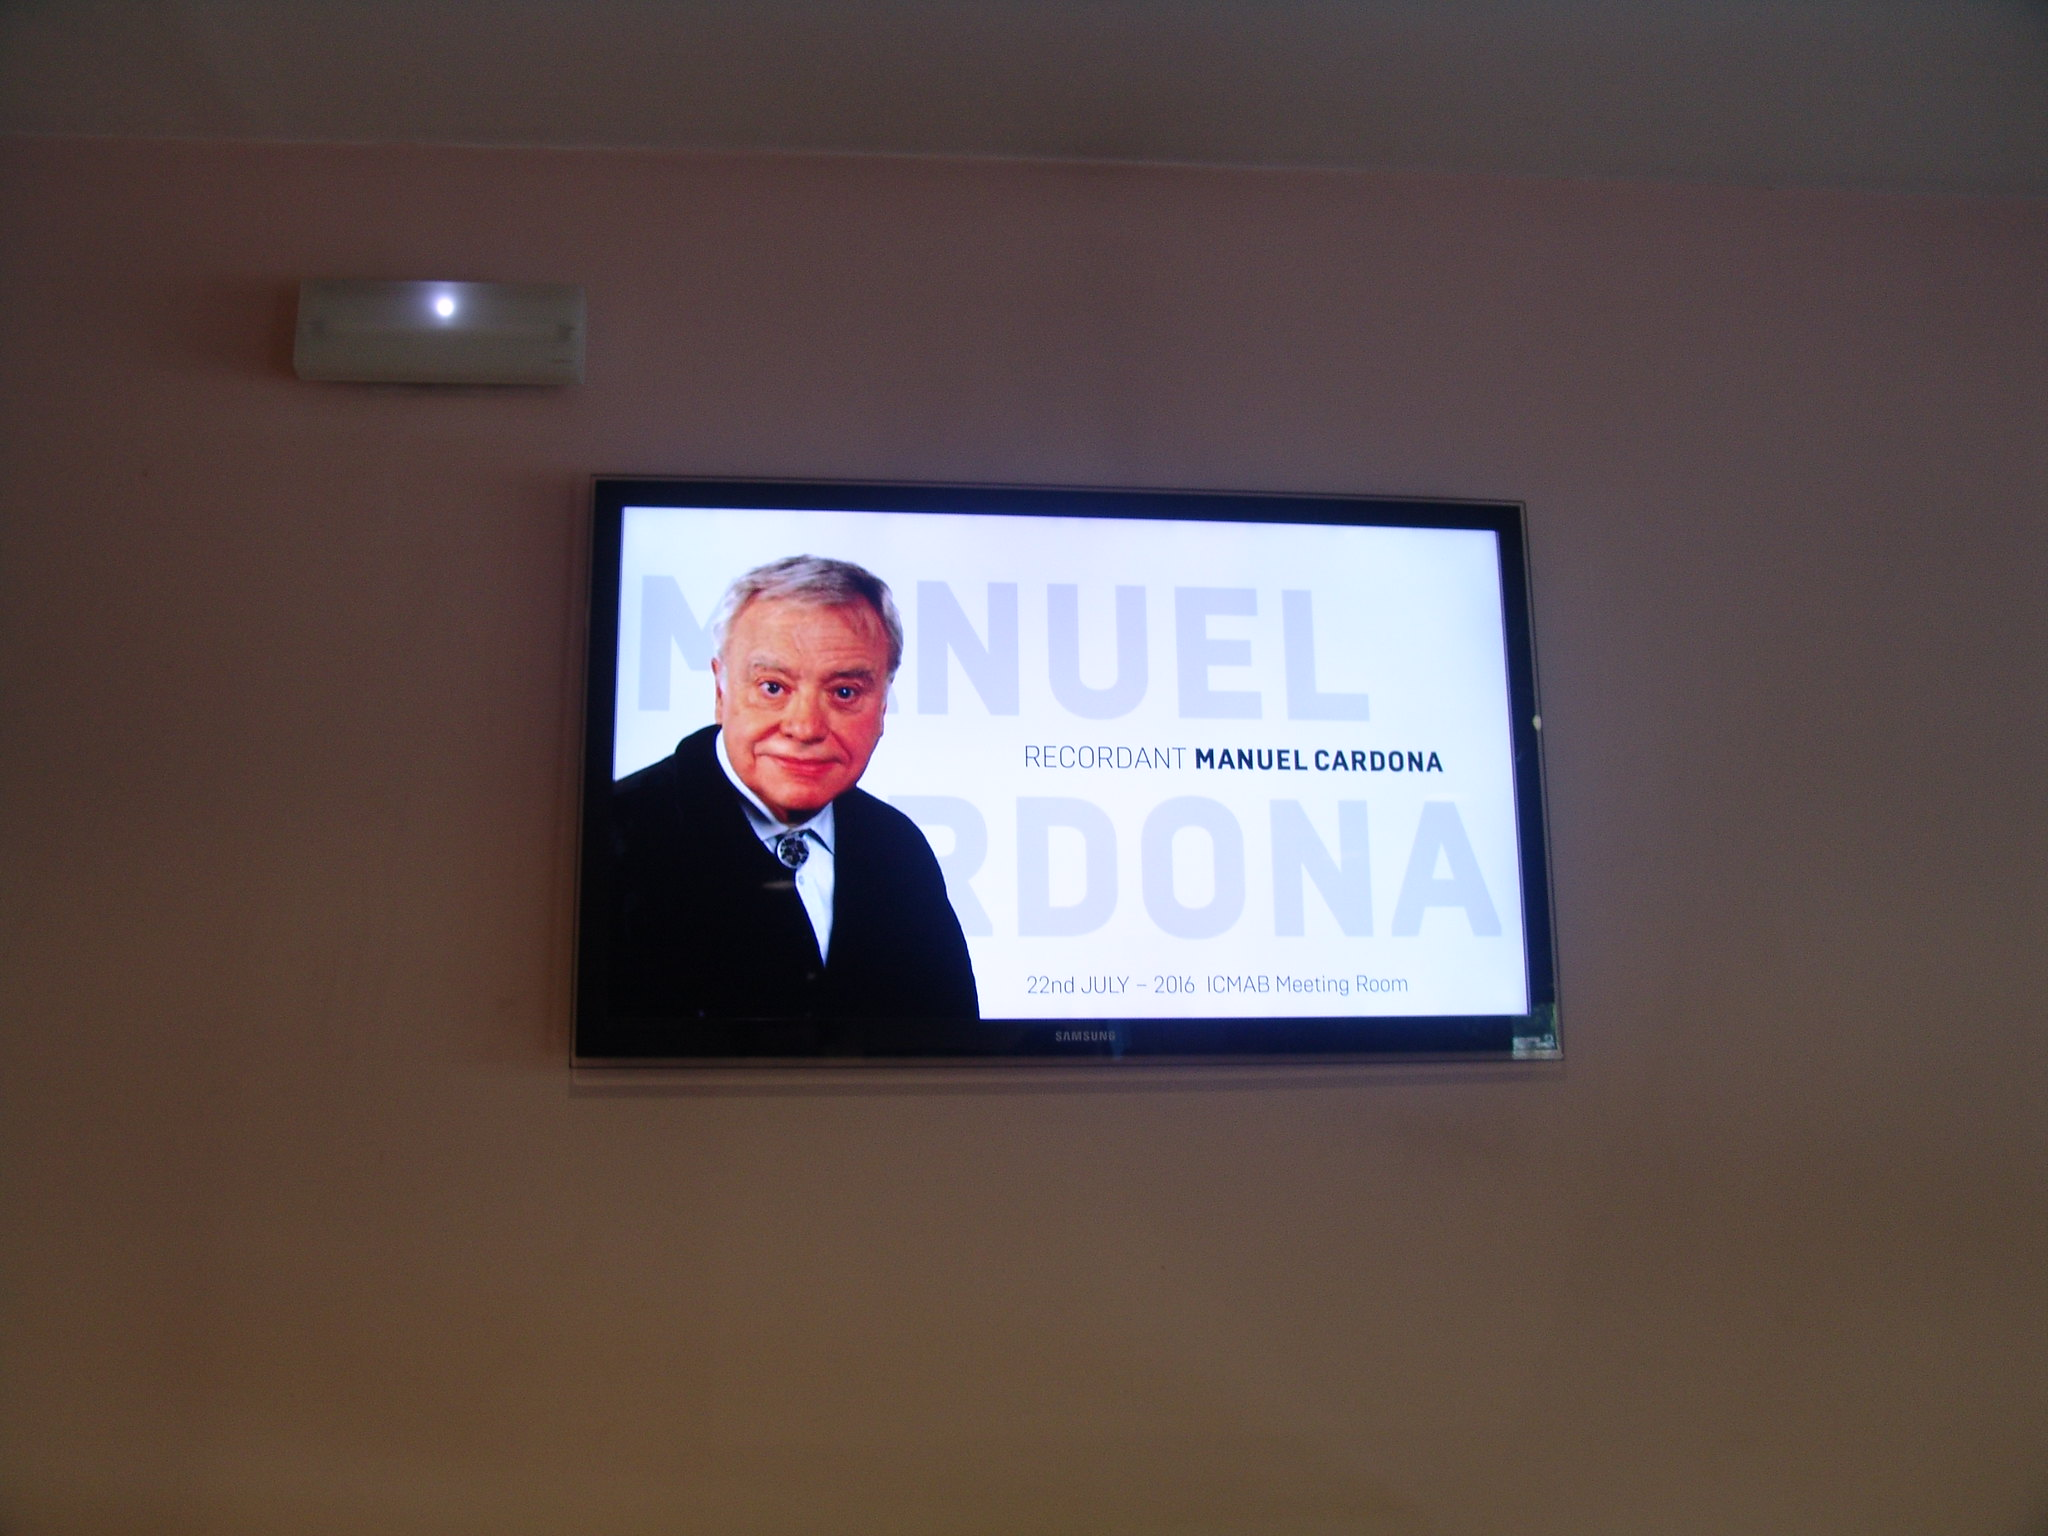 RECORDANT MANUEL CARDONA